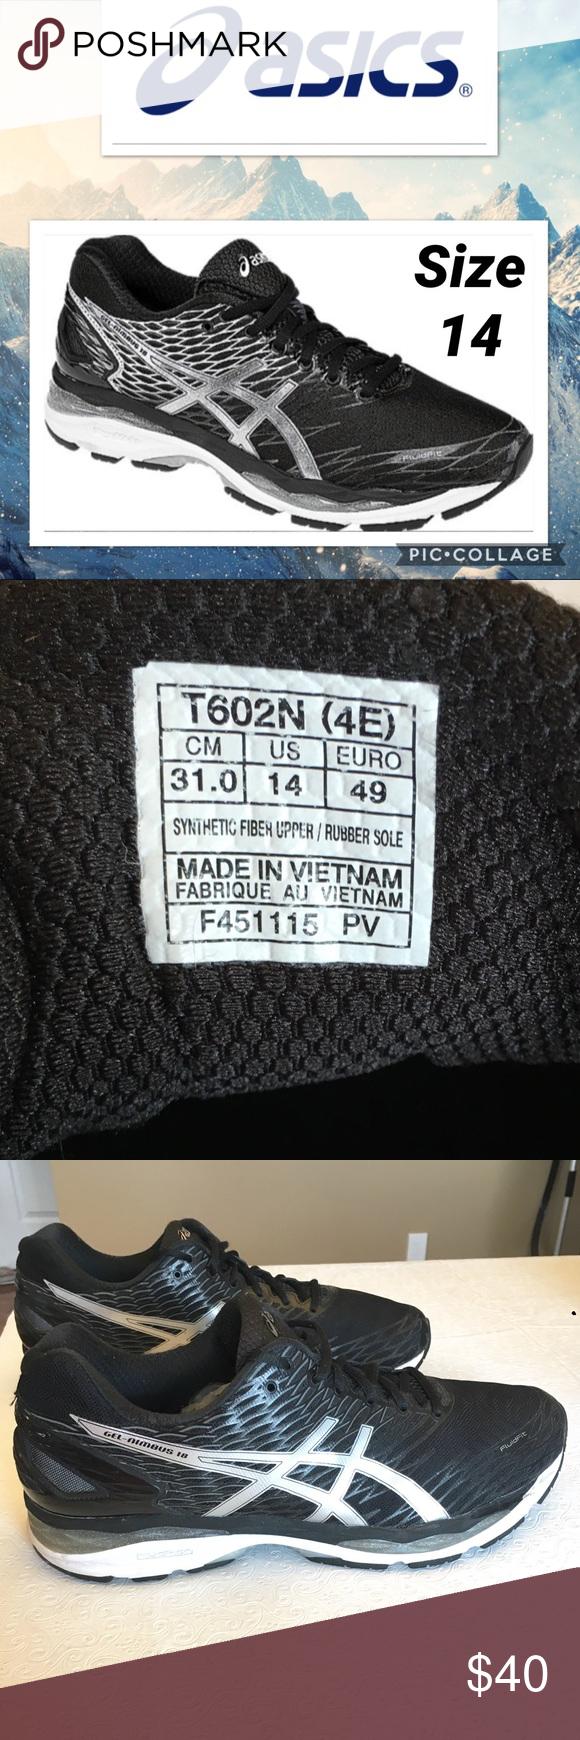 asics nimbus size 14 Cheaper Than Retail Price> Buy Clothing ...